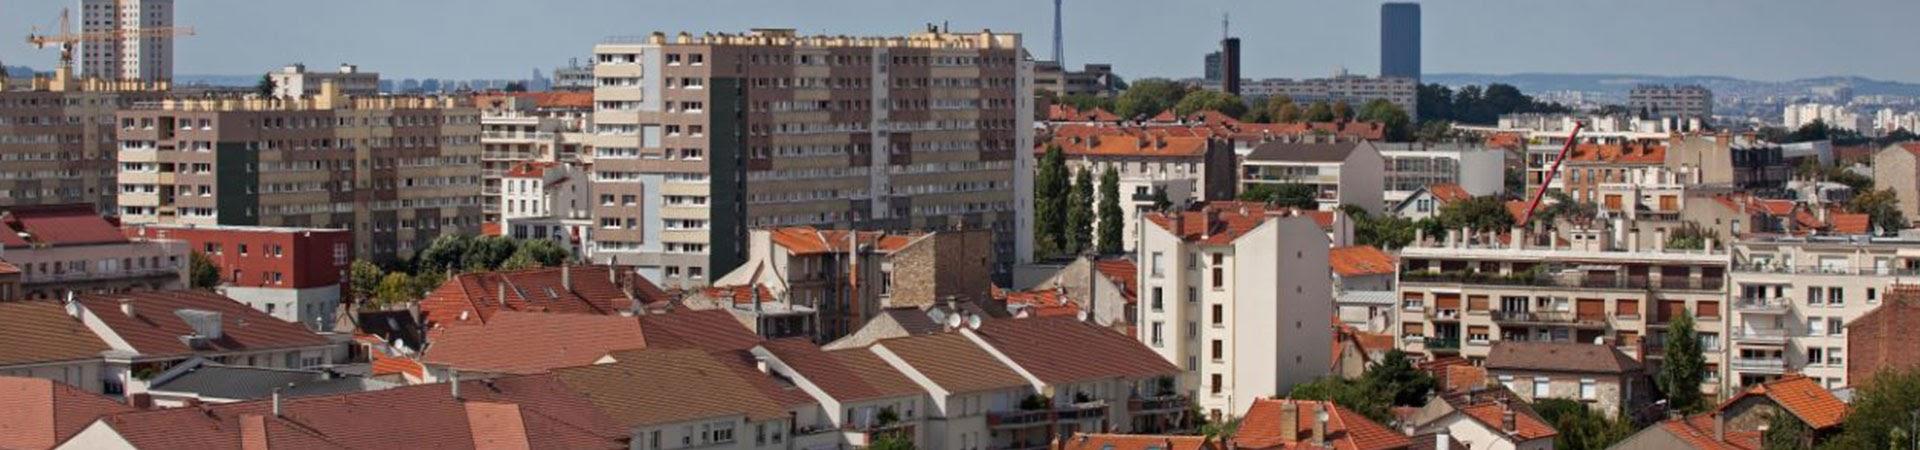 Immobilier Villejuif